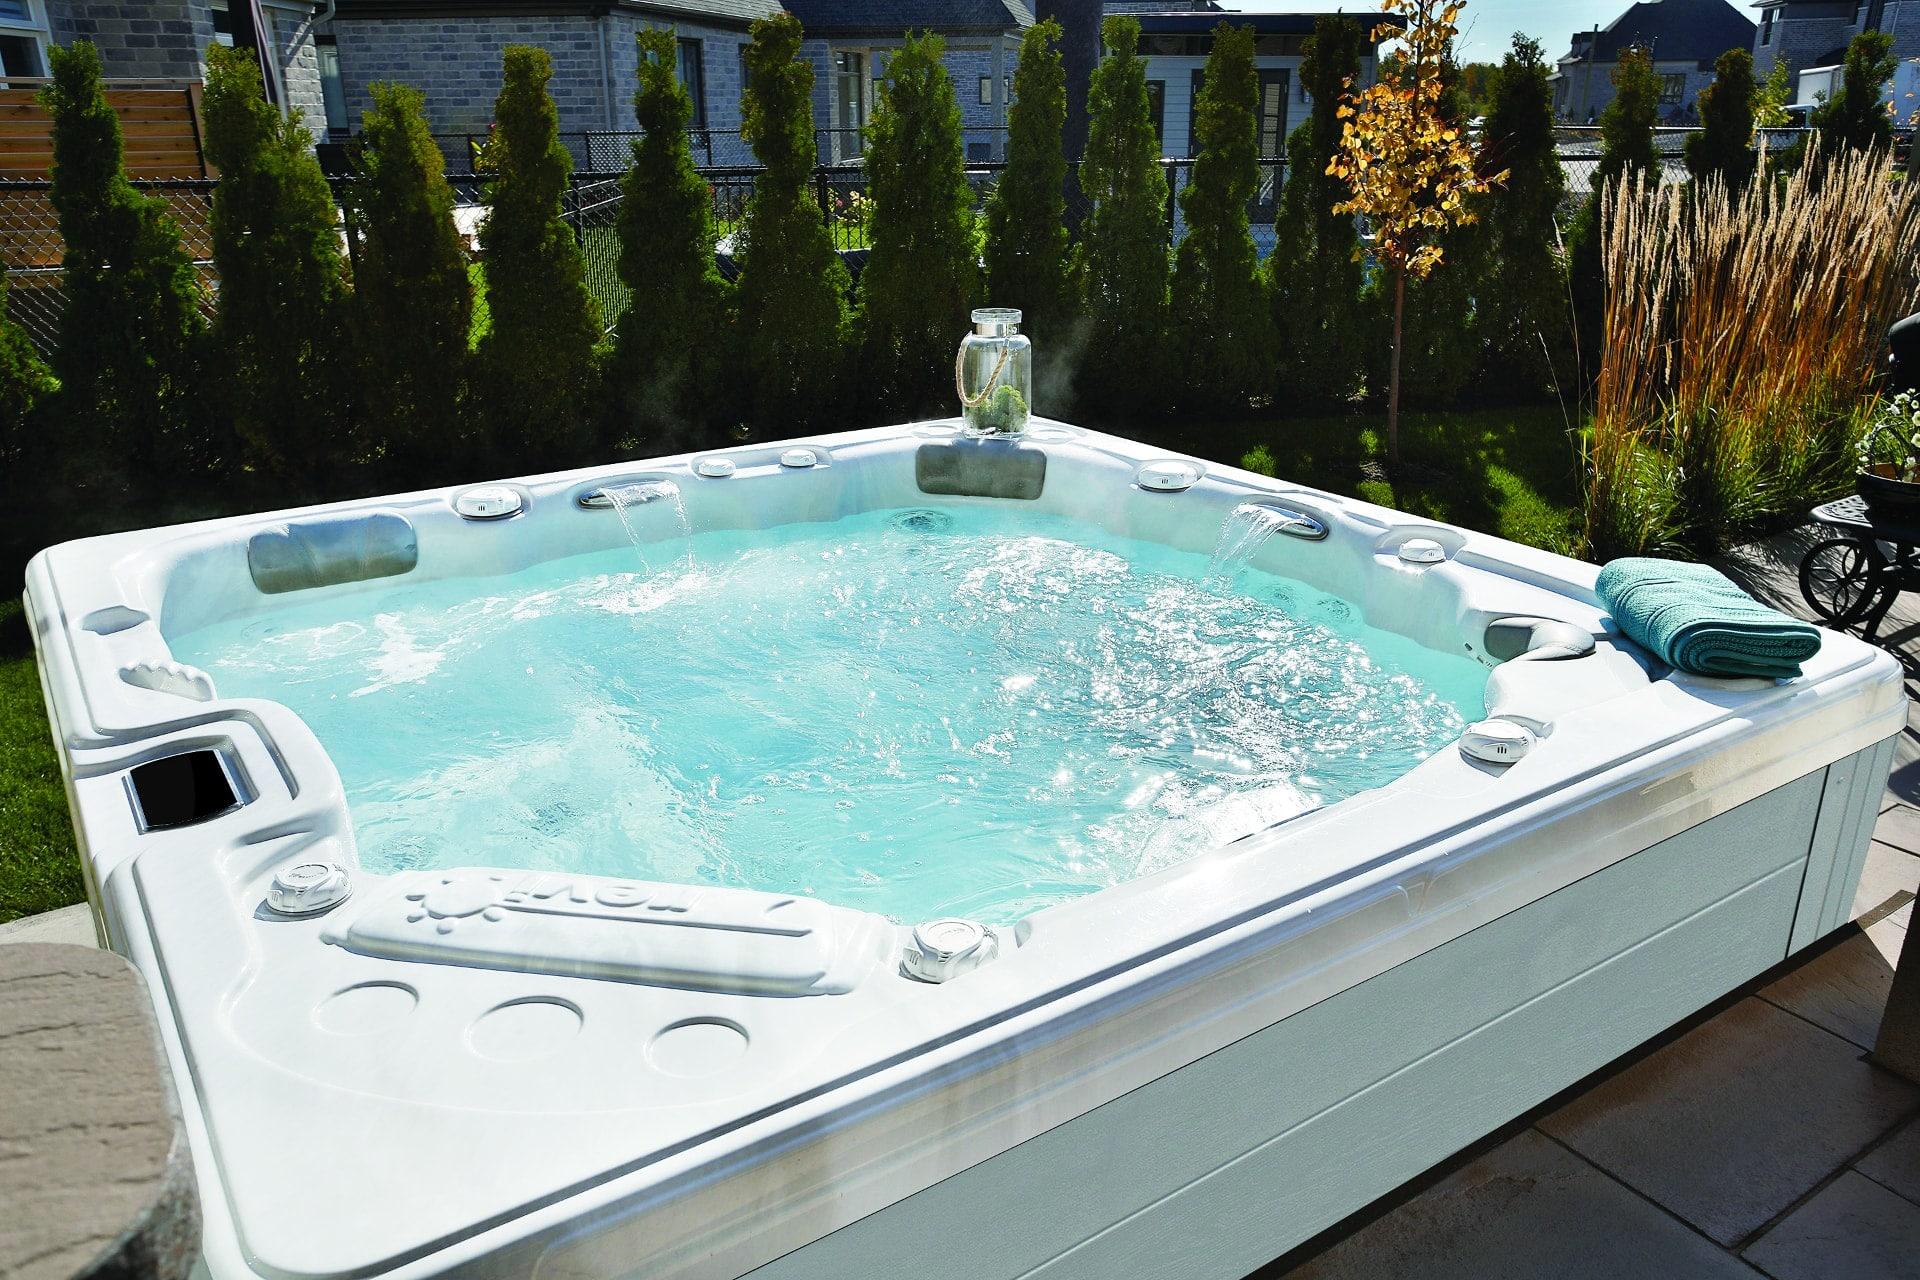 comment choisir son spa jacuzzi exterieur ibiza spa. Black Bedroom Furniture Sets. Home Design Ideas